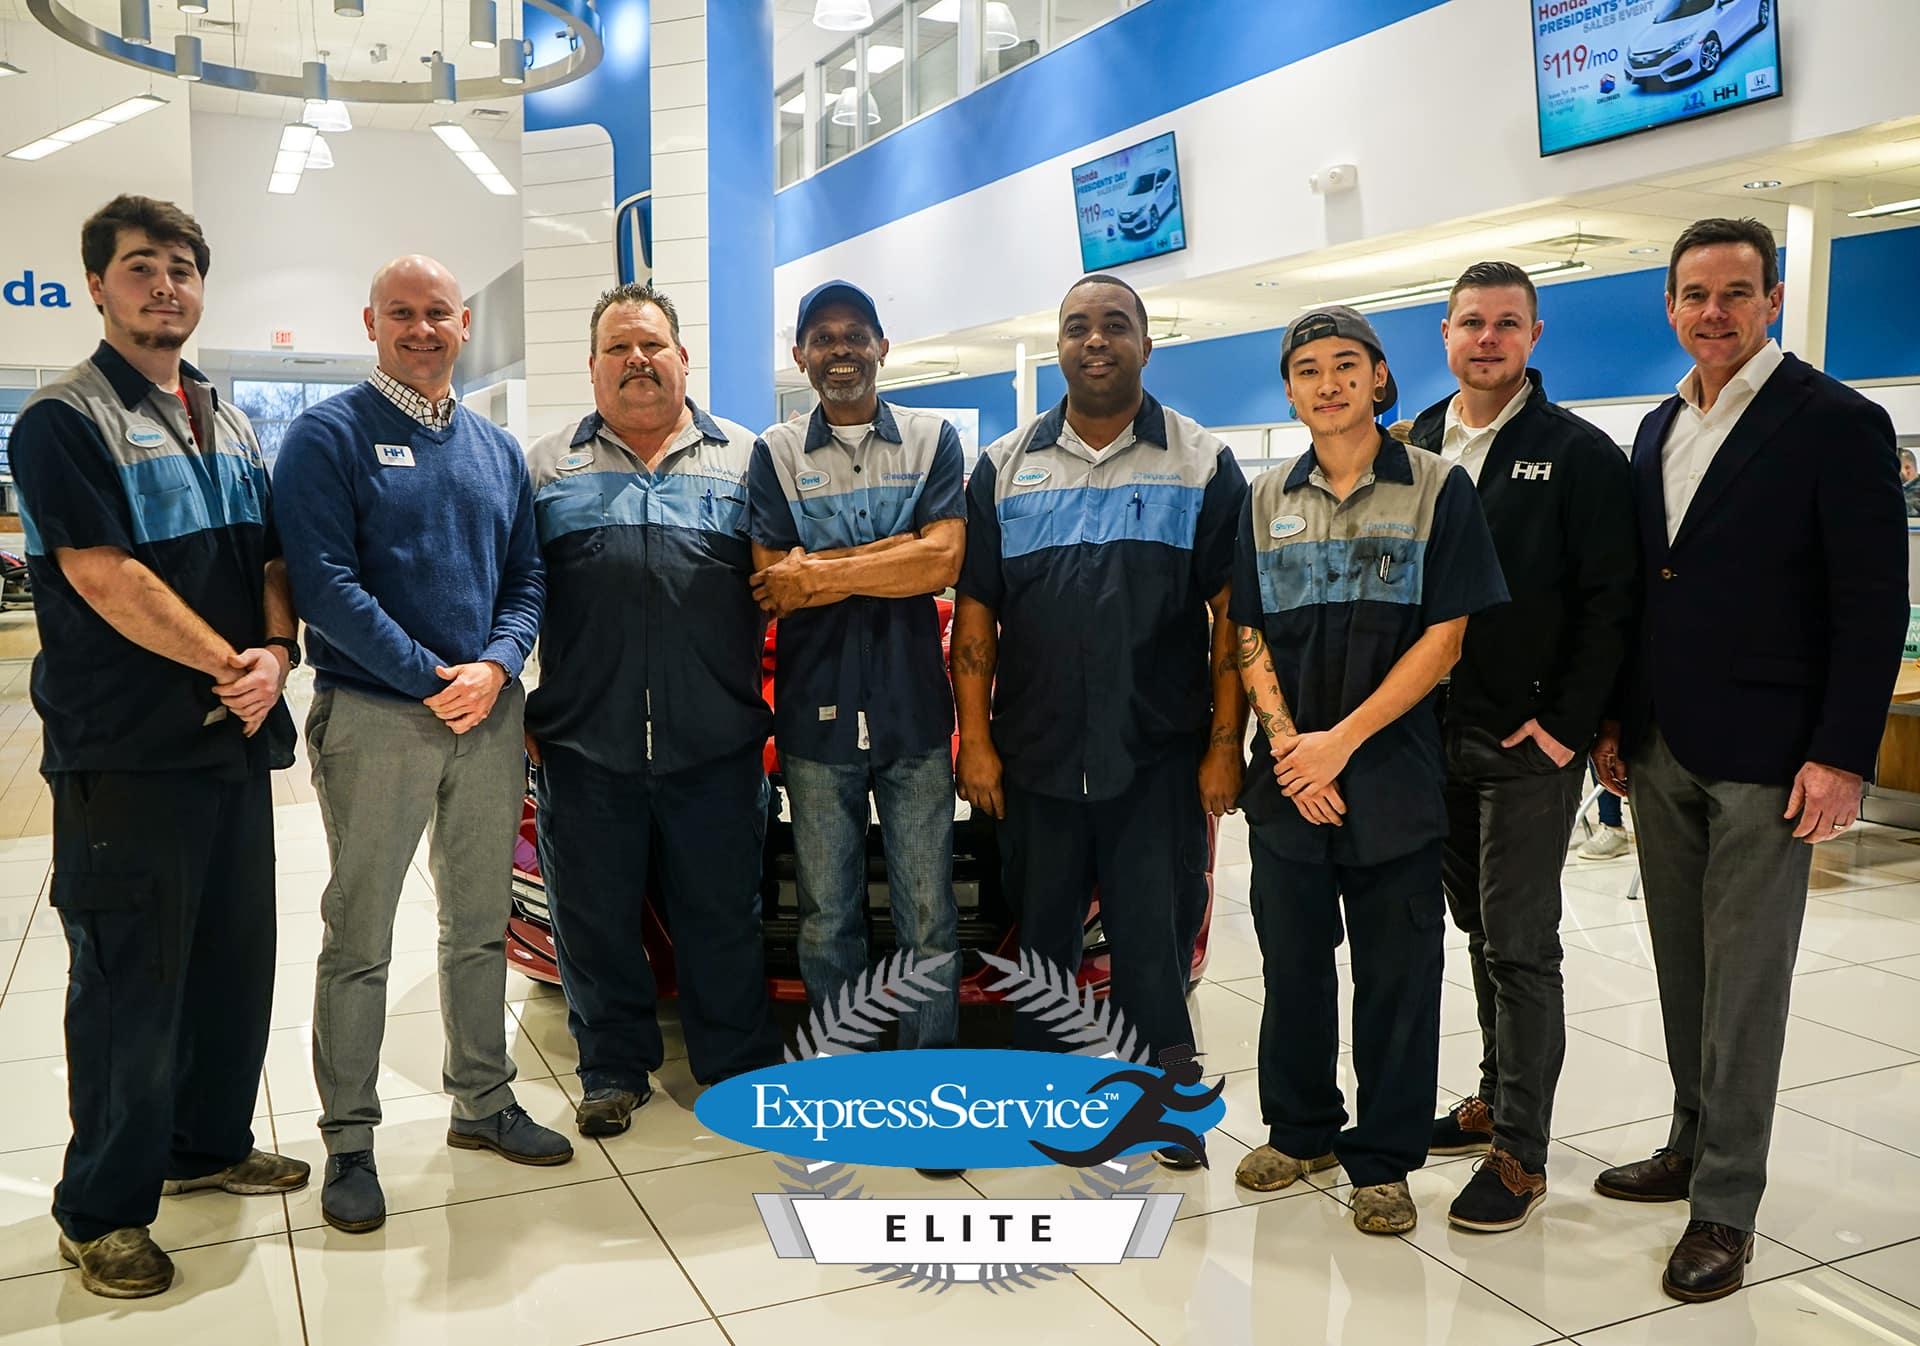 Express Service Elite Award, Holmes Honda, Honda Service, honda service shreveport